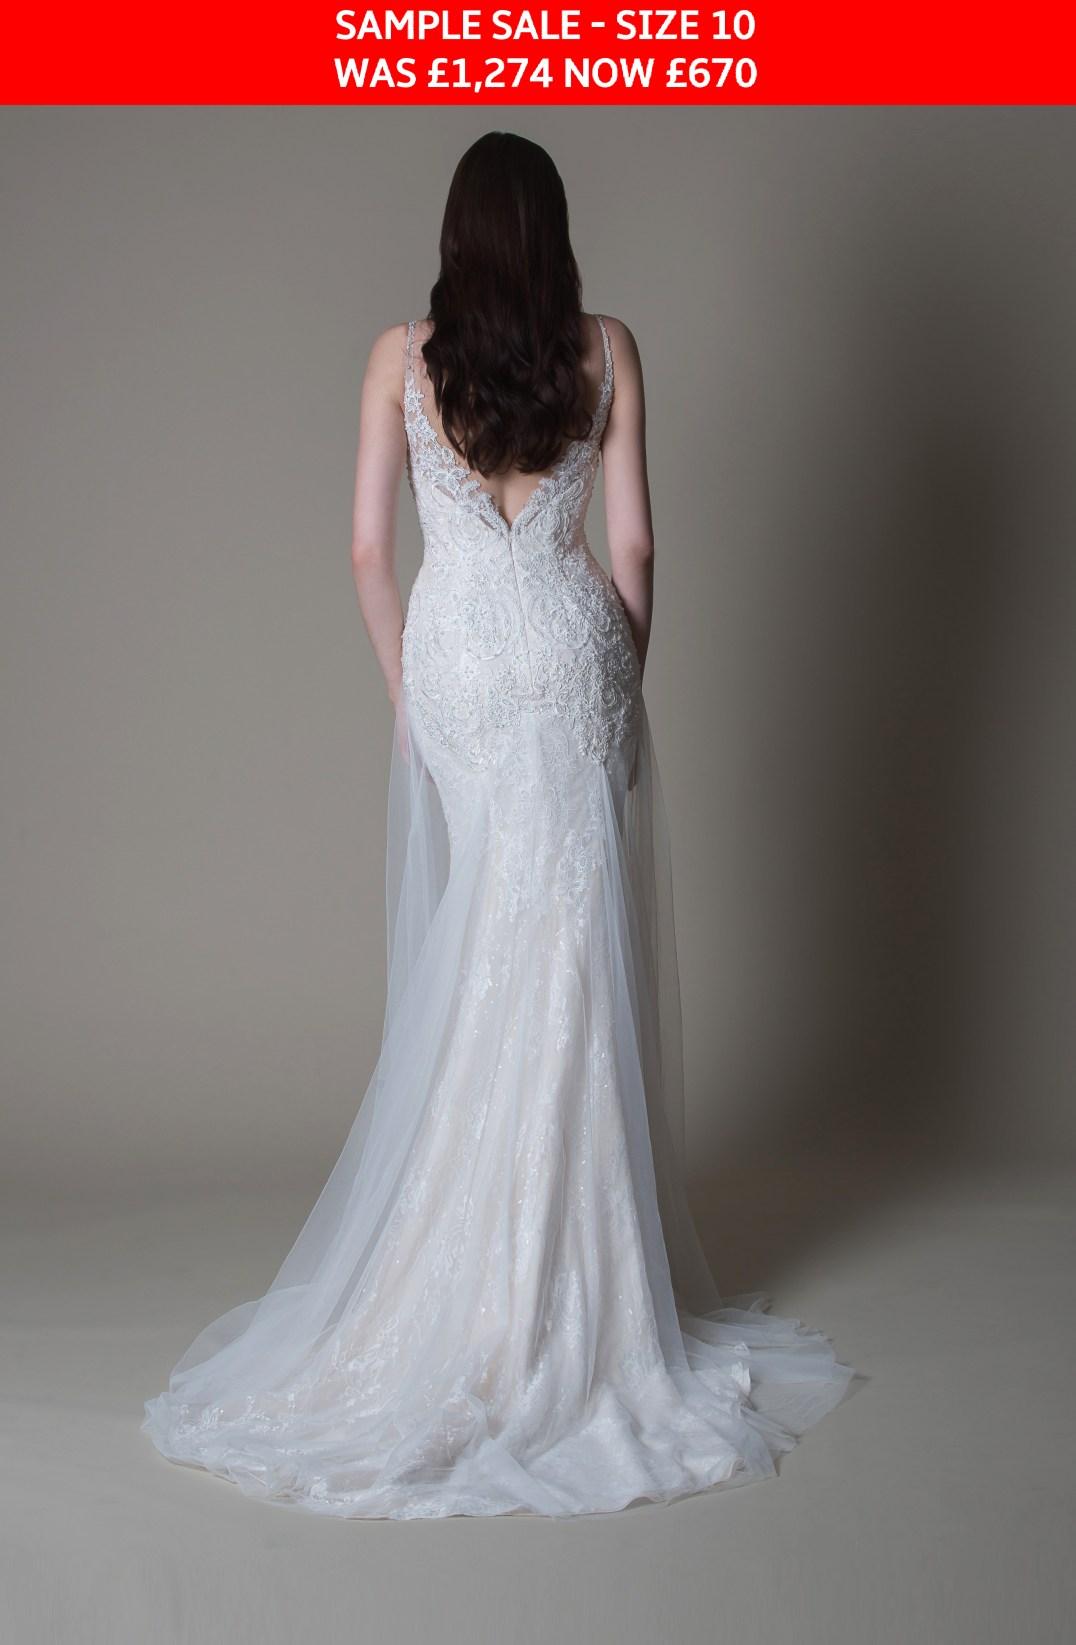 MiaMia Abigail wedding dress sample sale